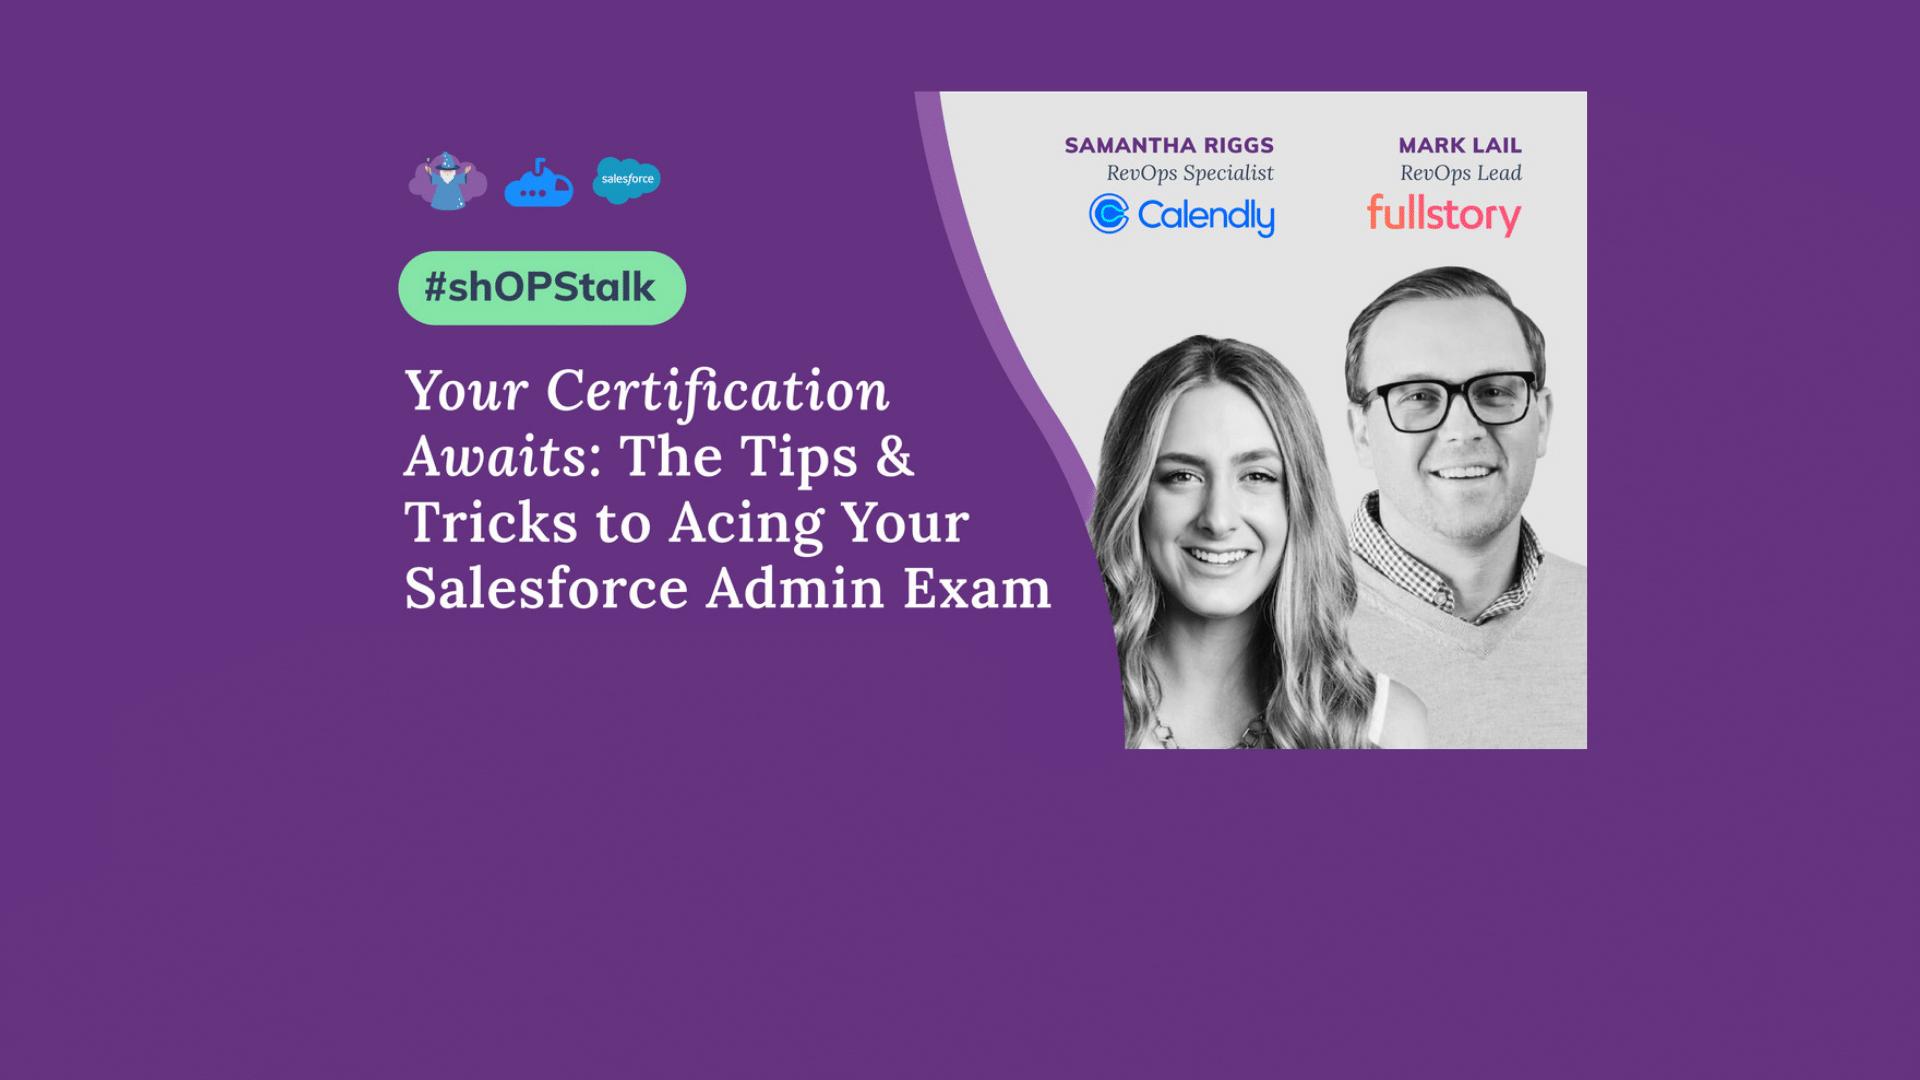 shOPS Talk Recap: The Tips & Tricks to Acing Your Salesforce Admin Exam